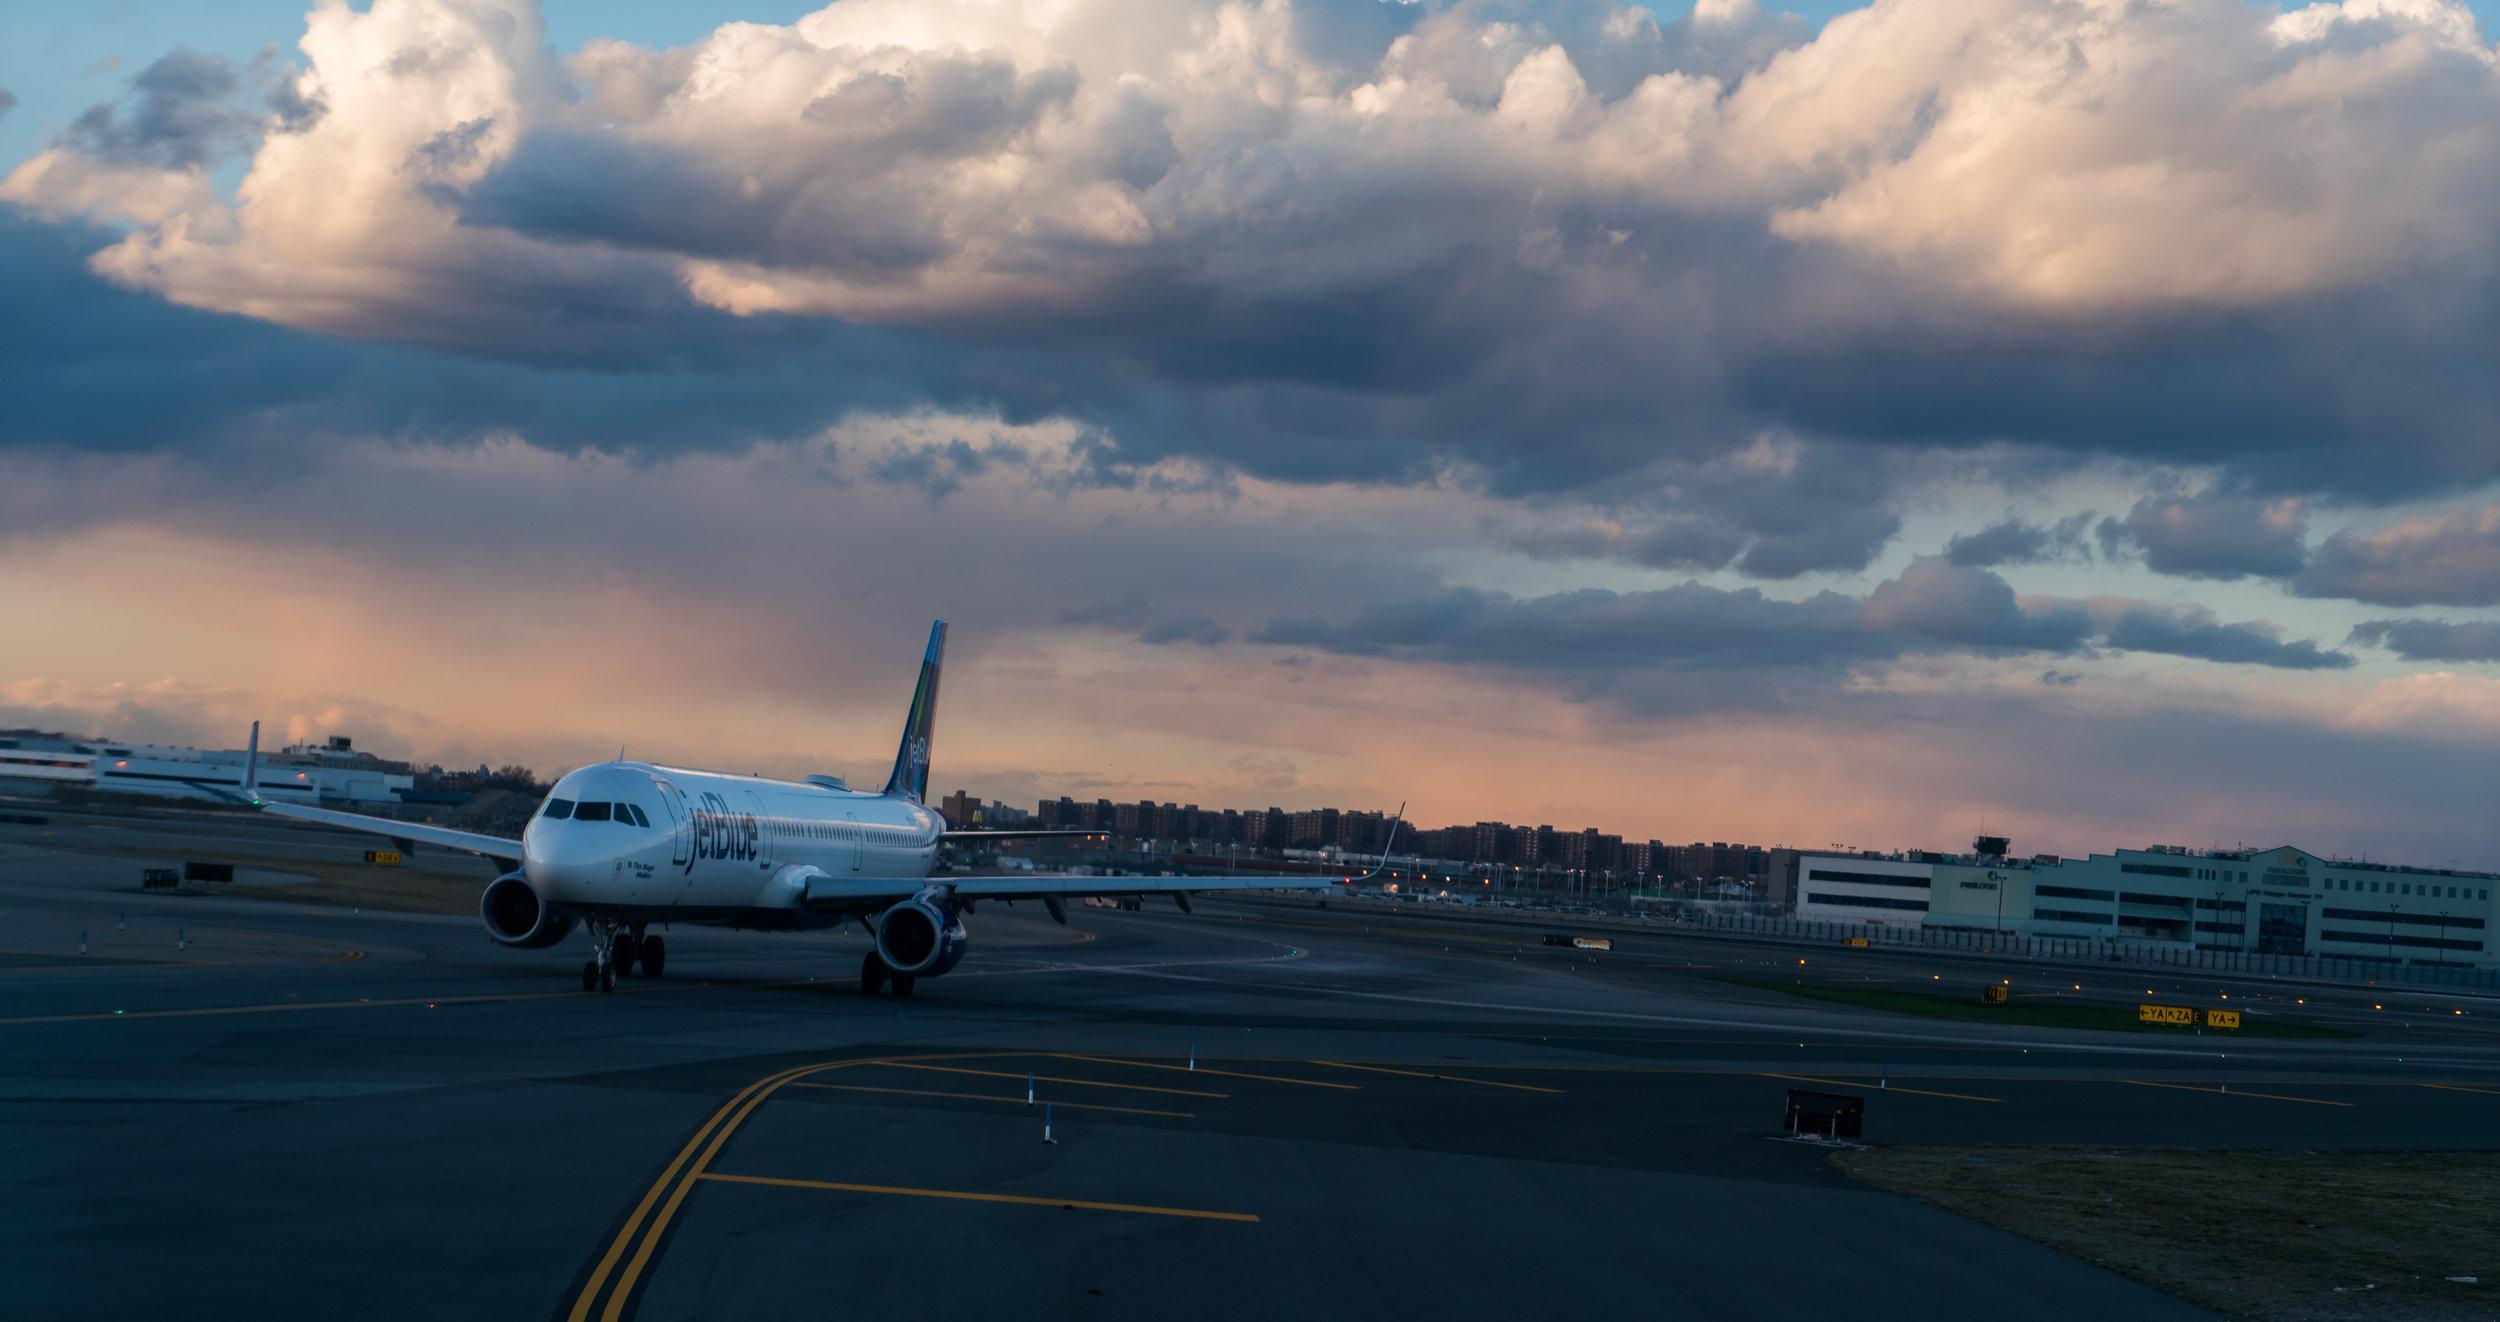 JetBlue sunset at JFK